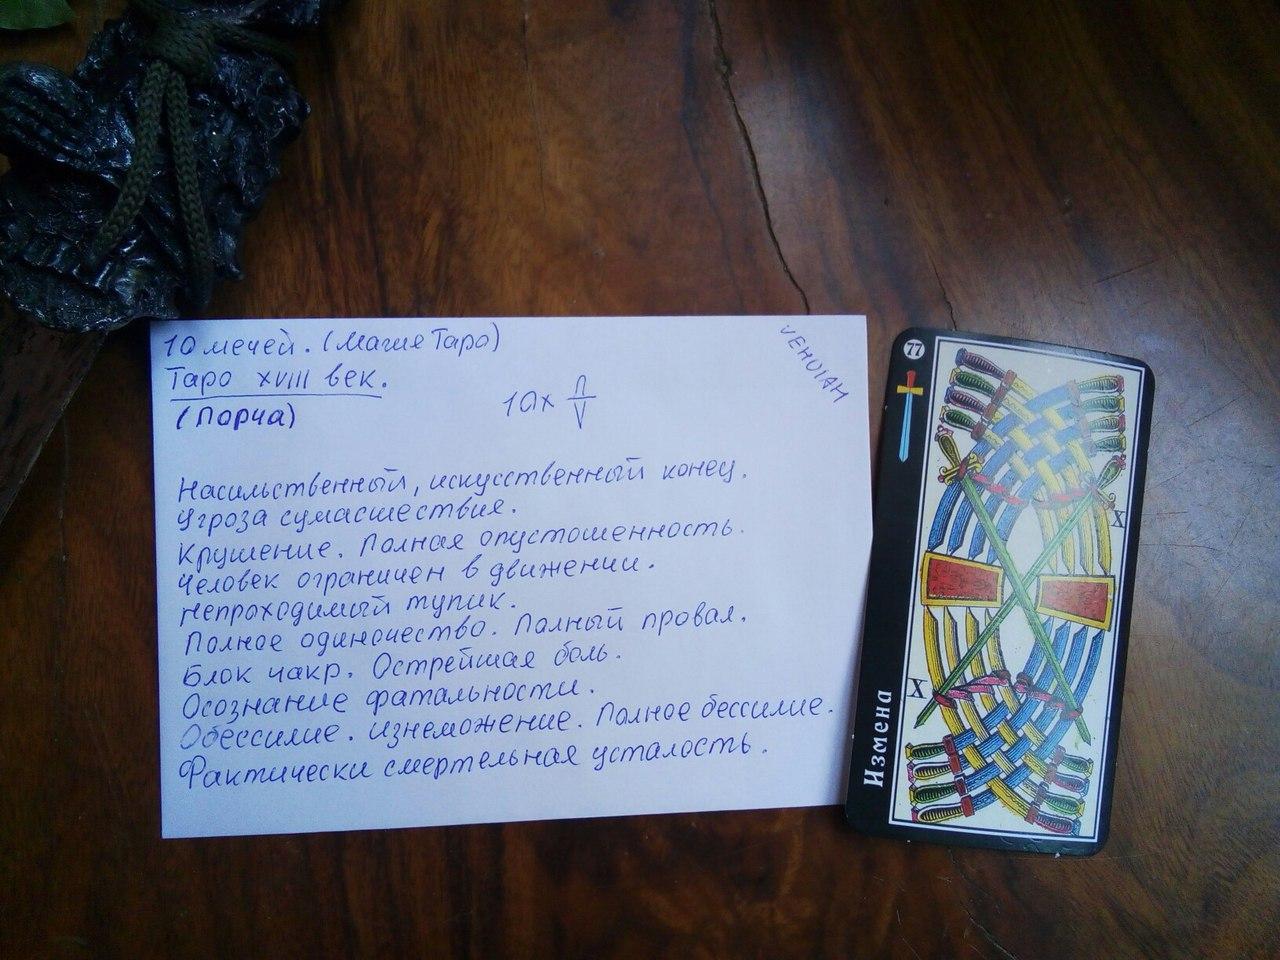 Хештег став на   Салон Магии и Мистики Елены Руденко. Киев ,тел: +380506251562 7_oaZ5Z0fUQ